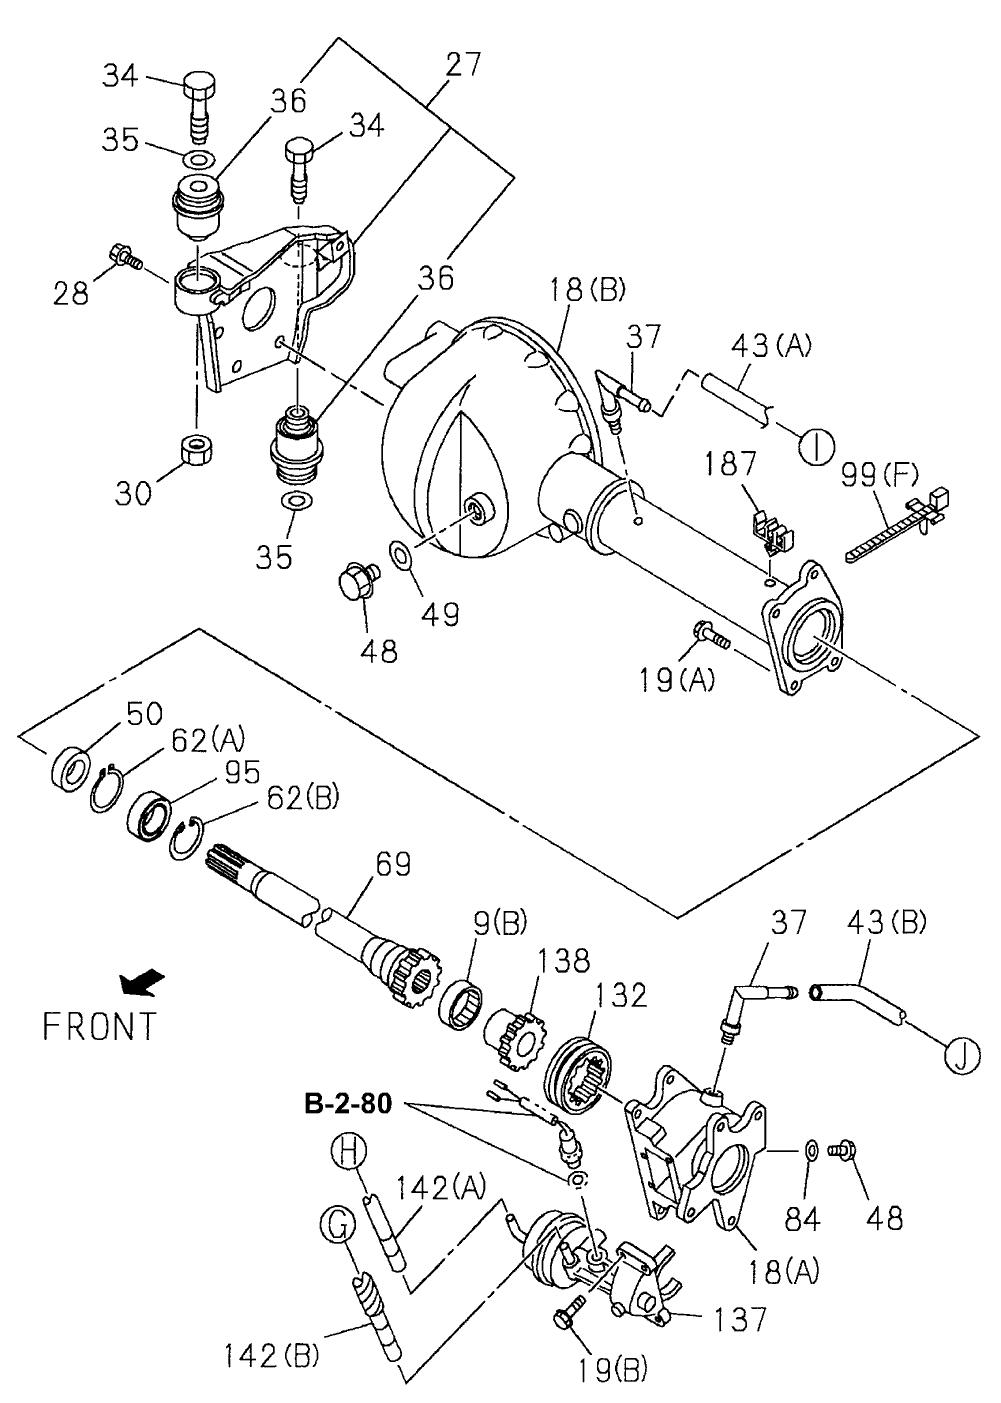 Case, FR  Axle (Gear Ratio 41/10)